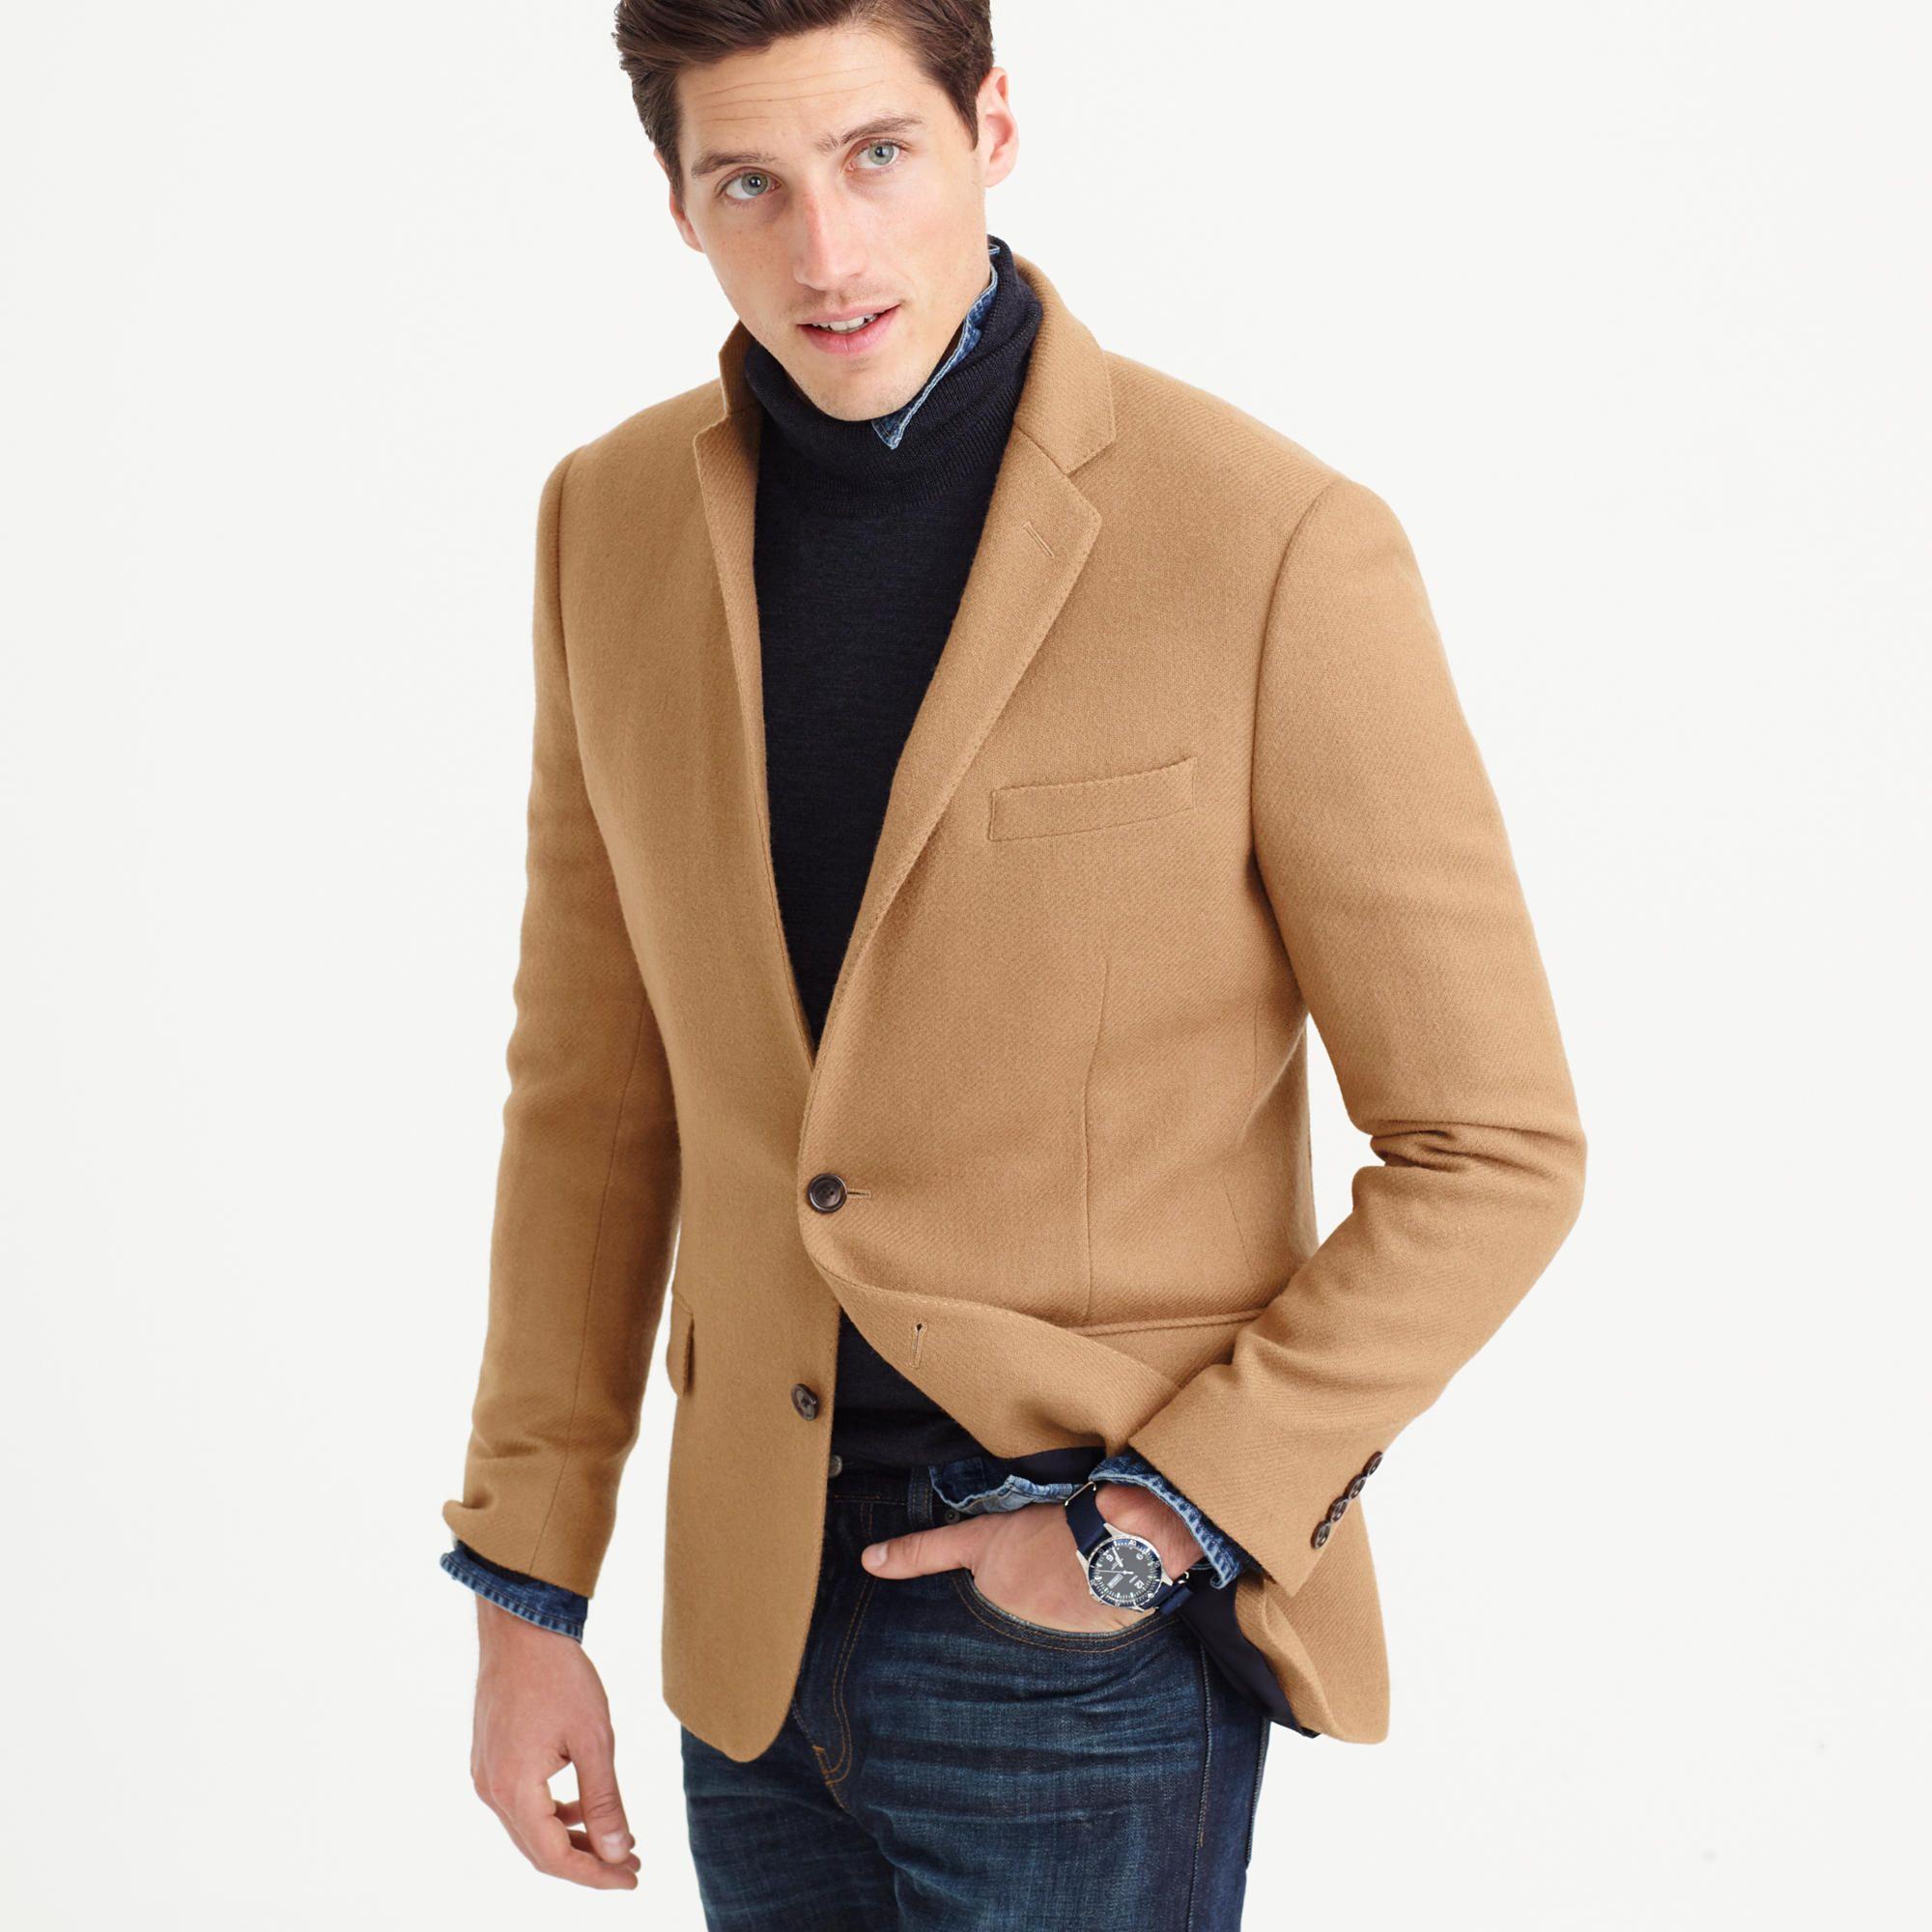 Ludlow sportcoat in English wool : sportcoats & vests   J.Crew ...